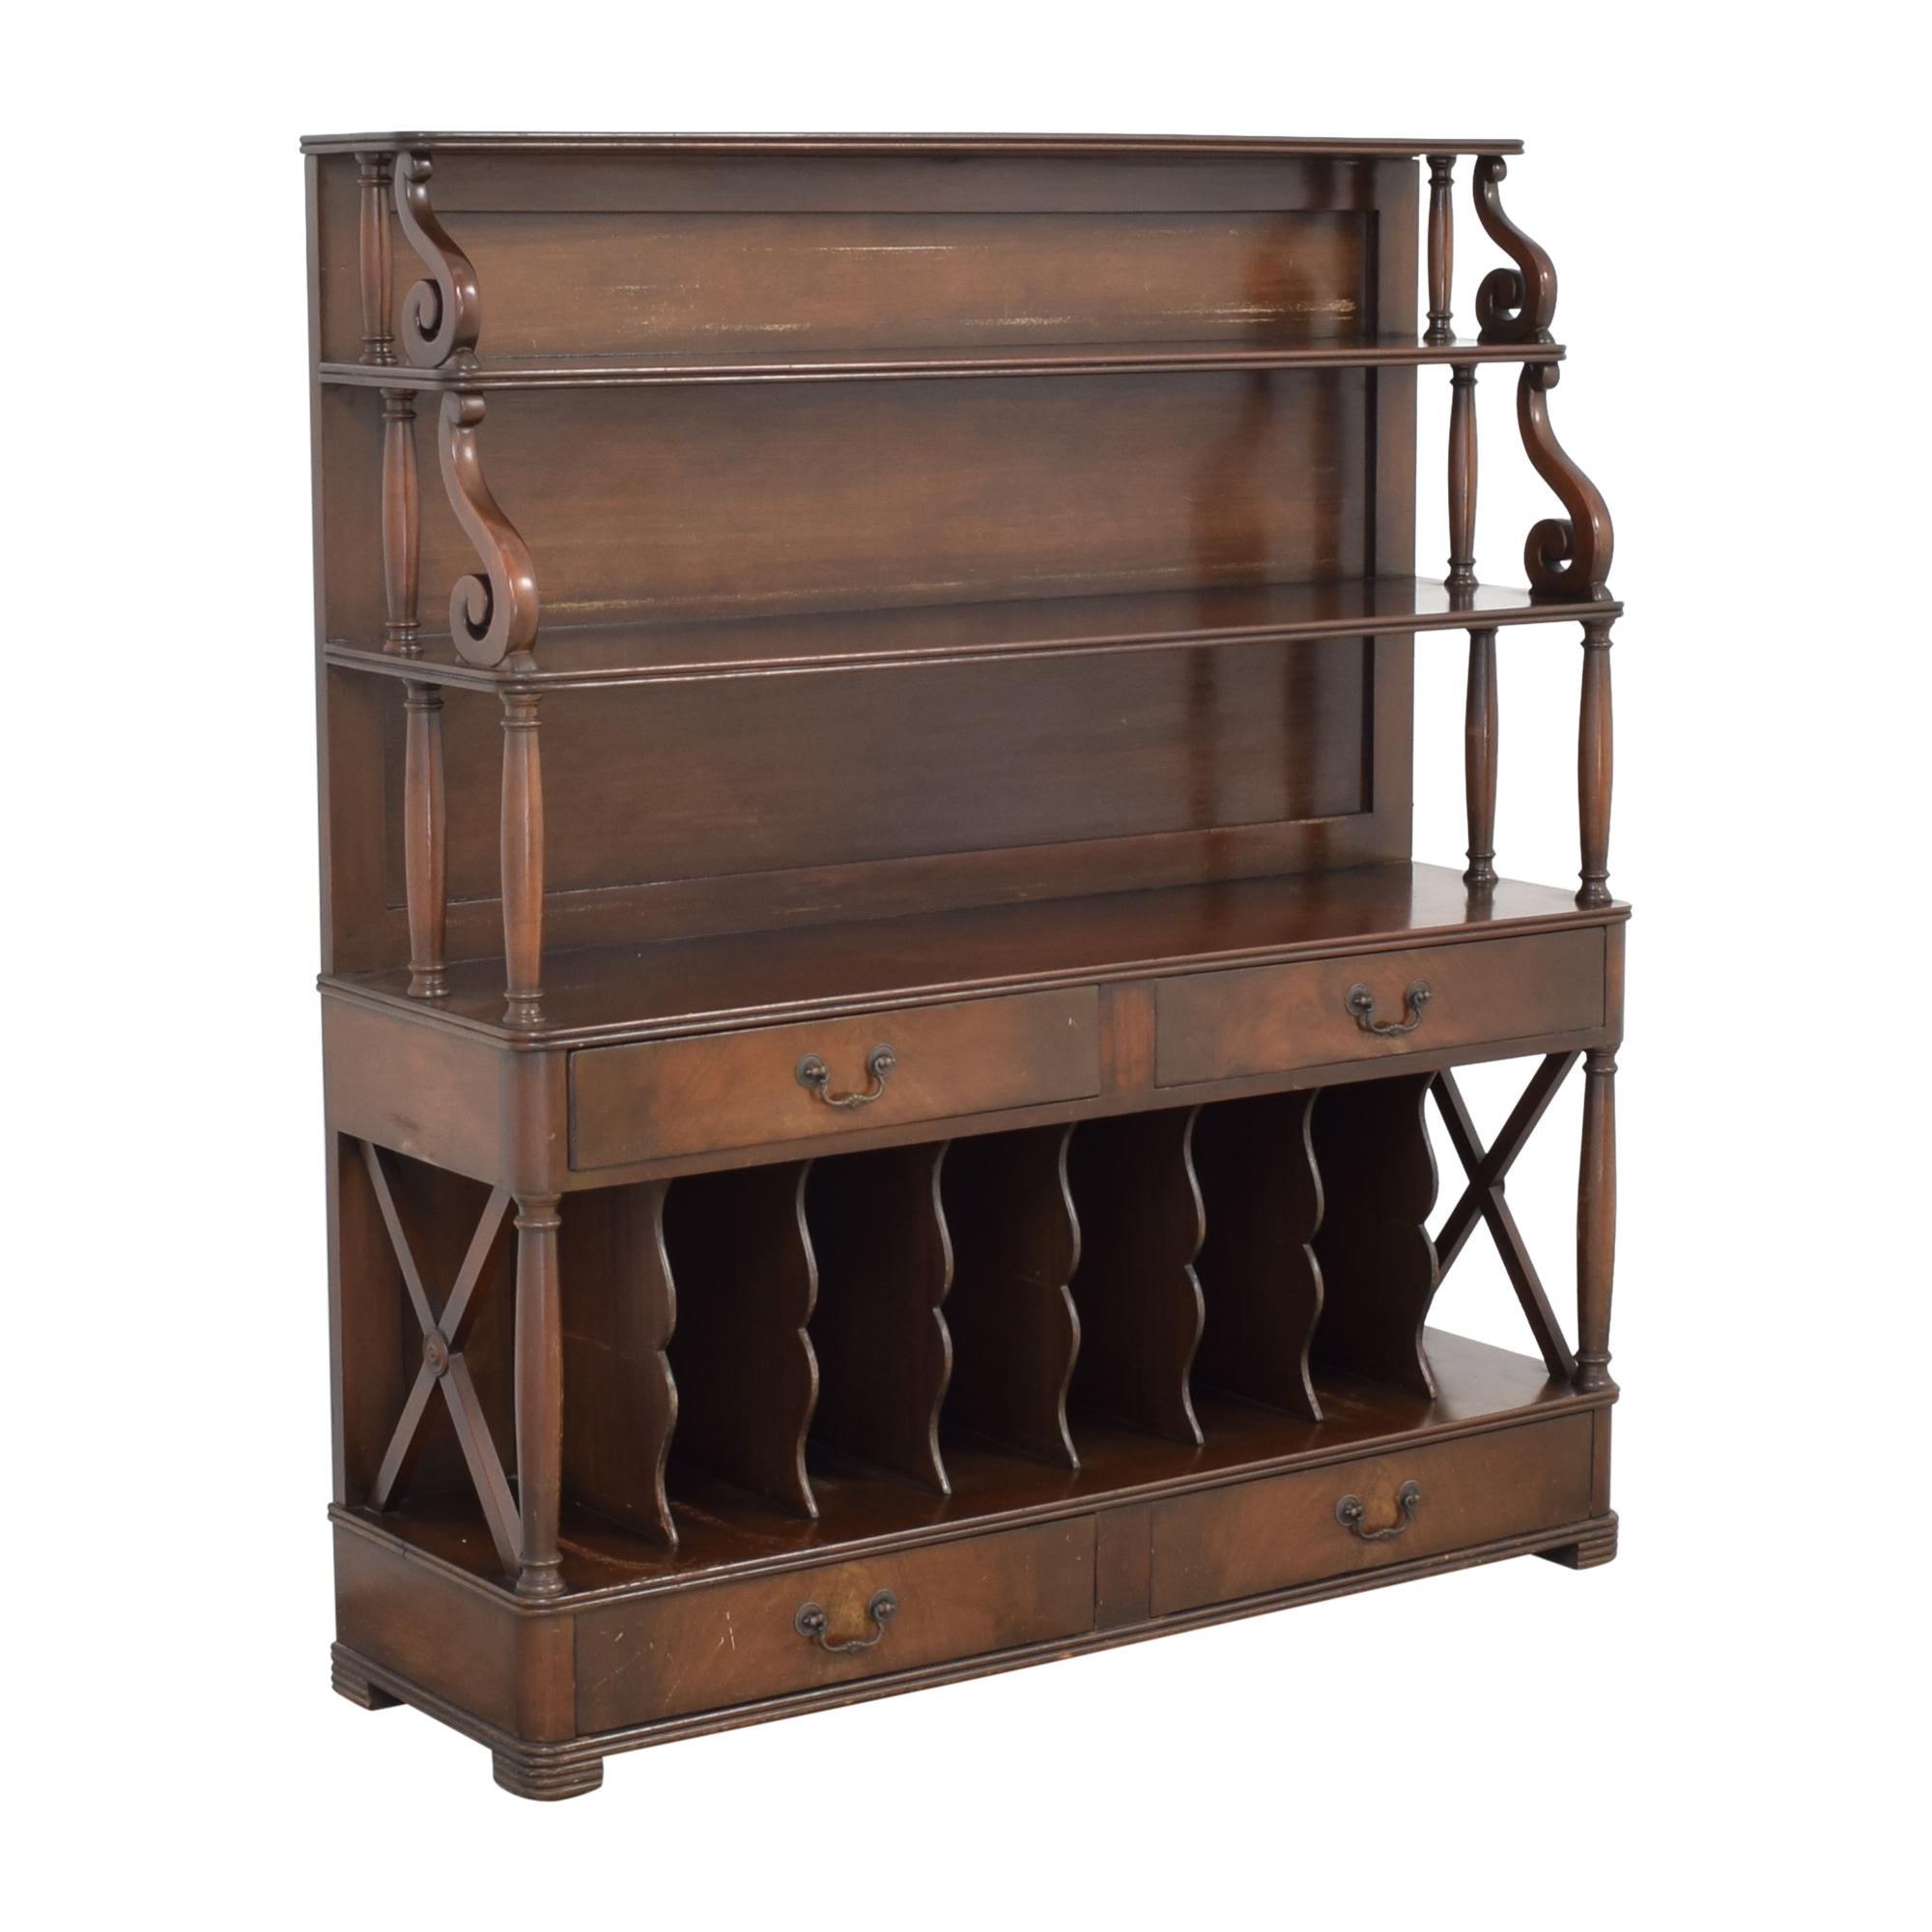 Vintage Four Drawer Sideboard Storage